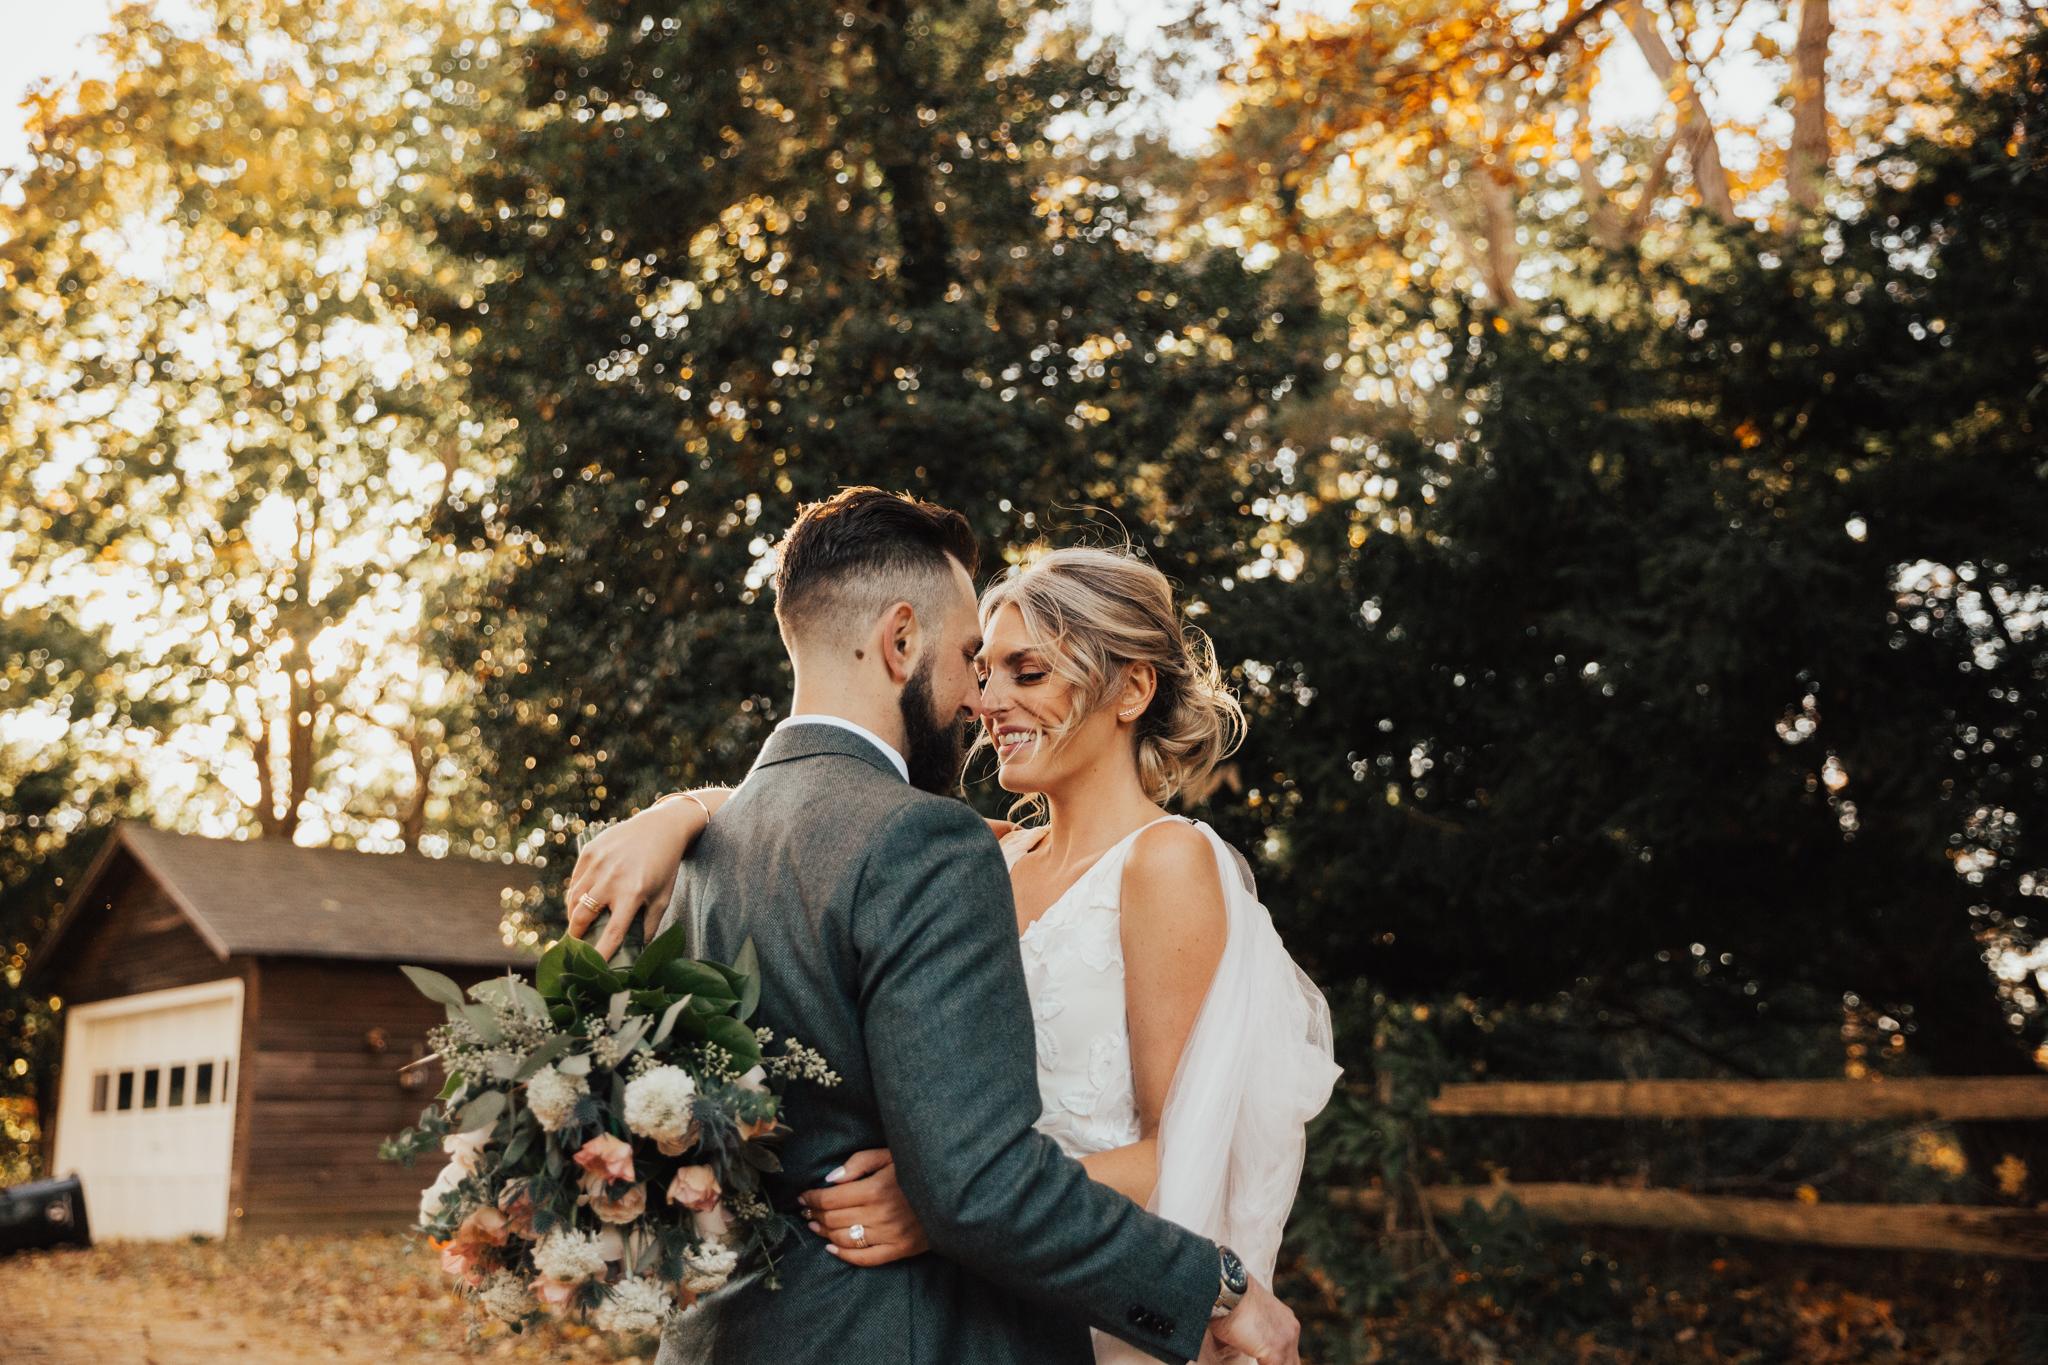 NYC NJ based wedding photographer